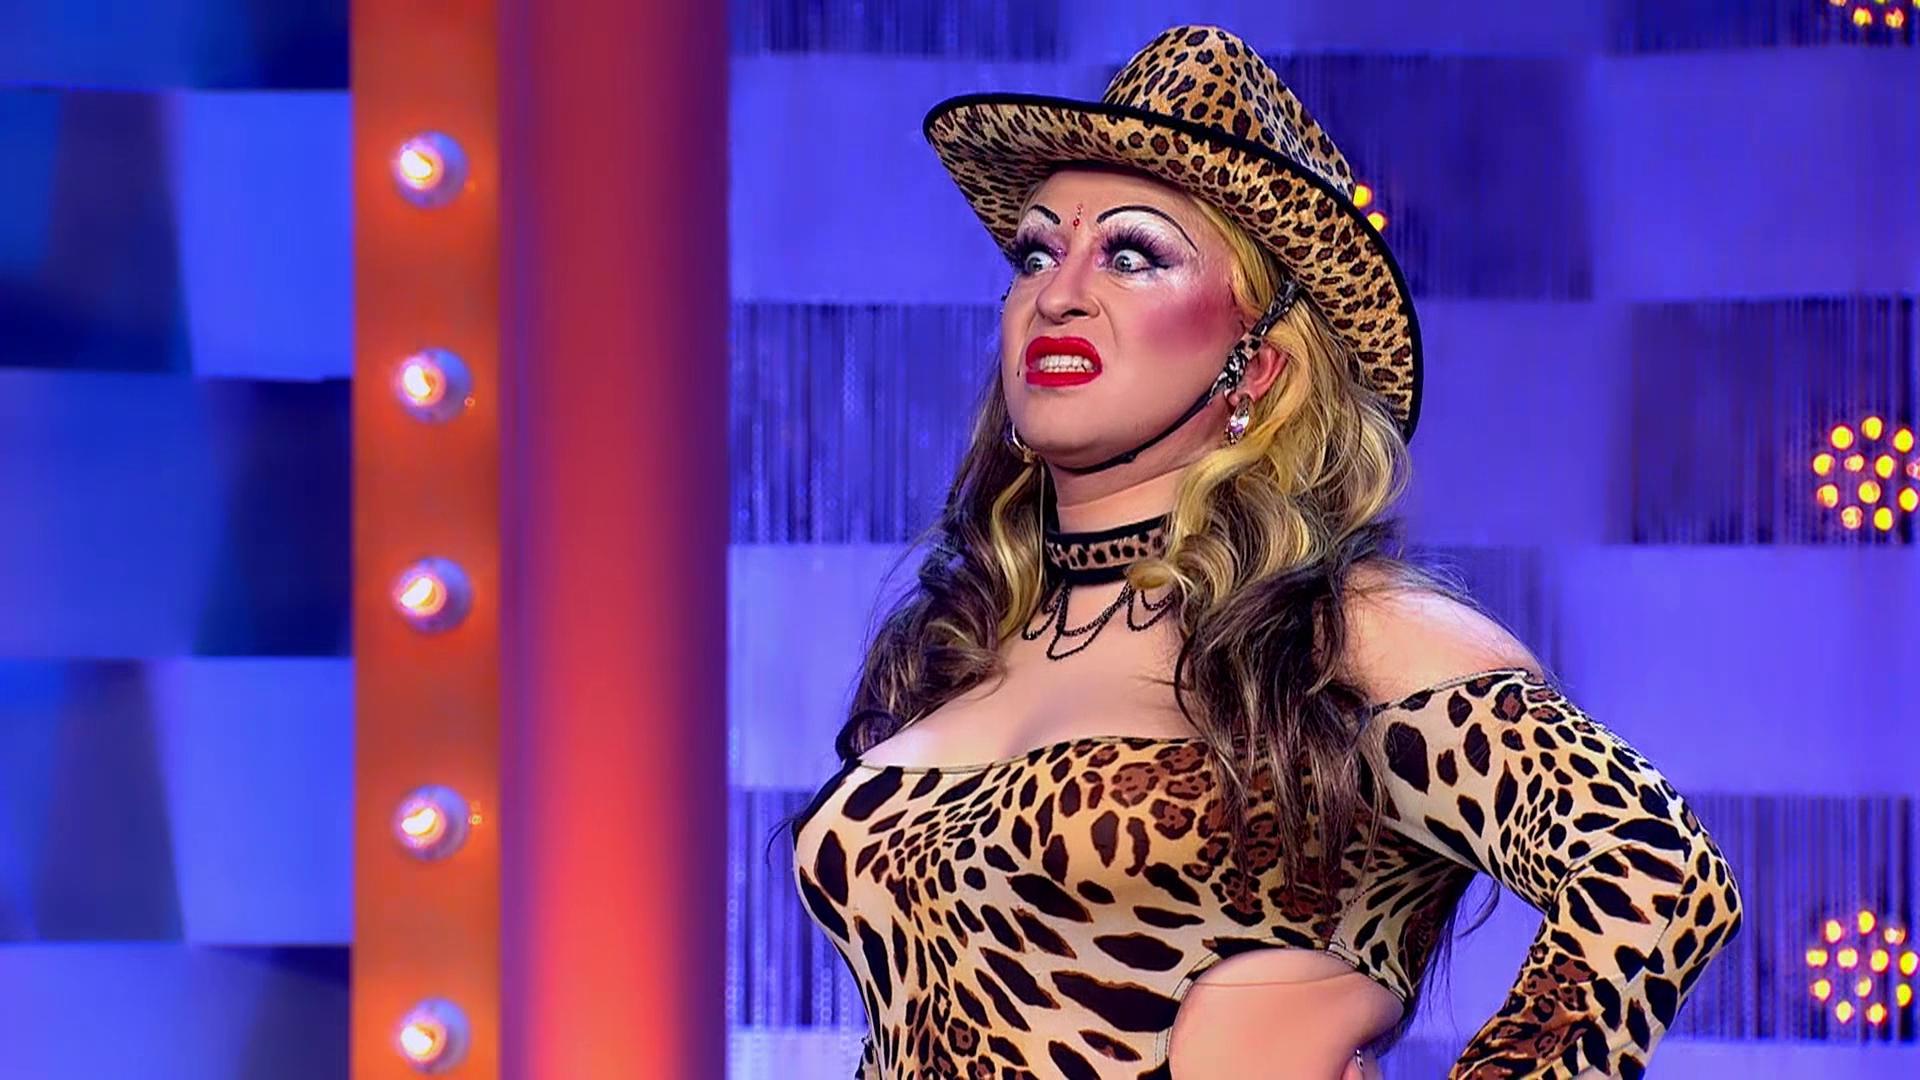 Cena de Drag Race España. Nela, vemos Pupi Poisson. Ela é uma drag queen branca, gorda e baixa. Usa peruca loira, chapéu de cowboy e roupa de estampa de oncinha. Ela faz cara de brava, mostrando os dentes.